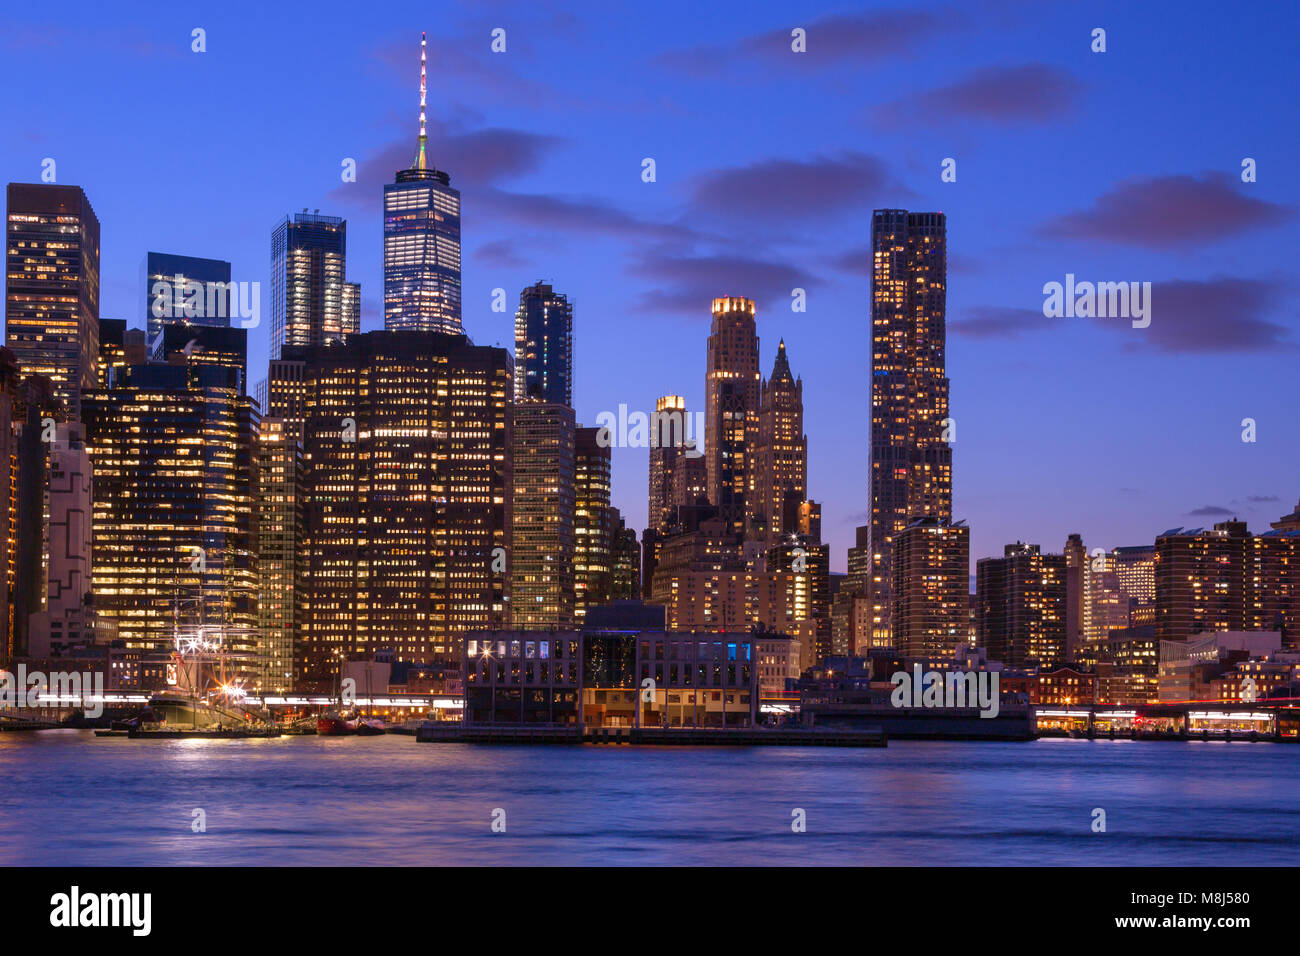 DOWNTOWN SKYLINE EAST RIVER MANHATTAN NEW YORK CITY USA - Stock Image